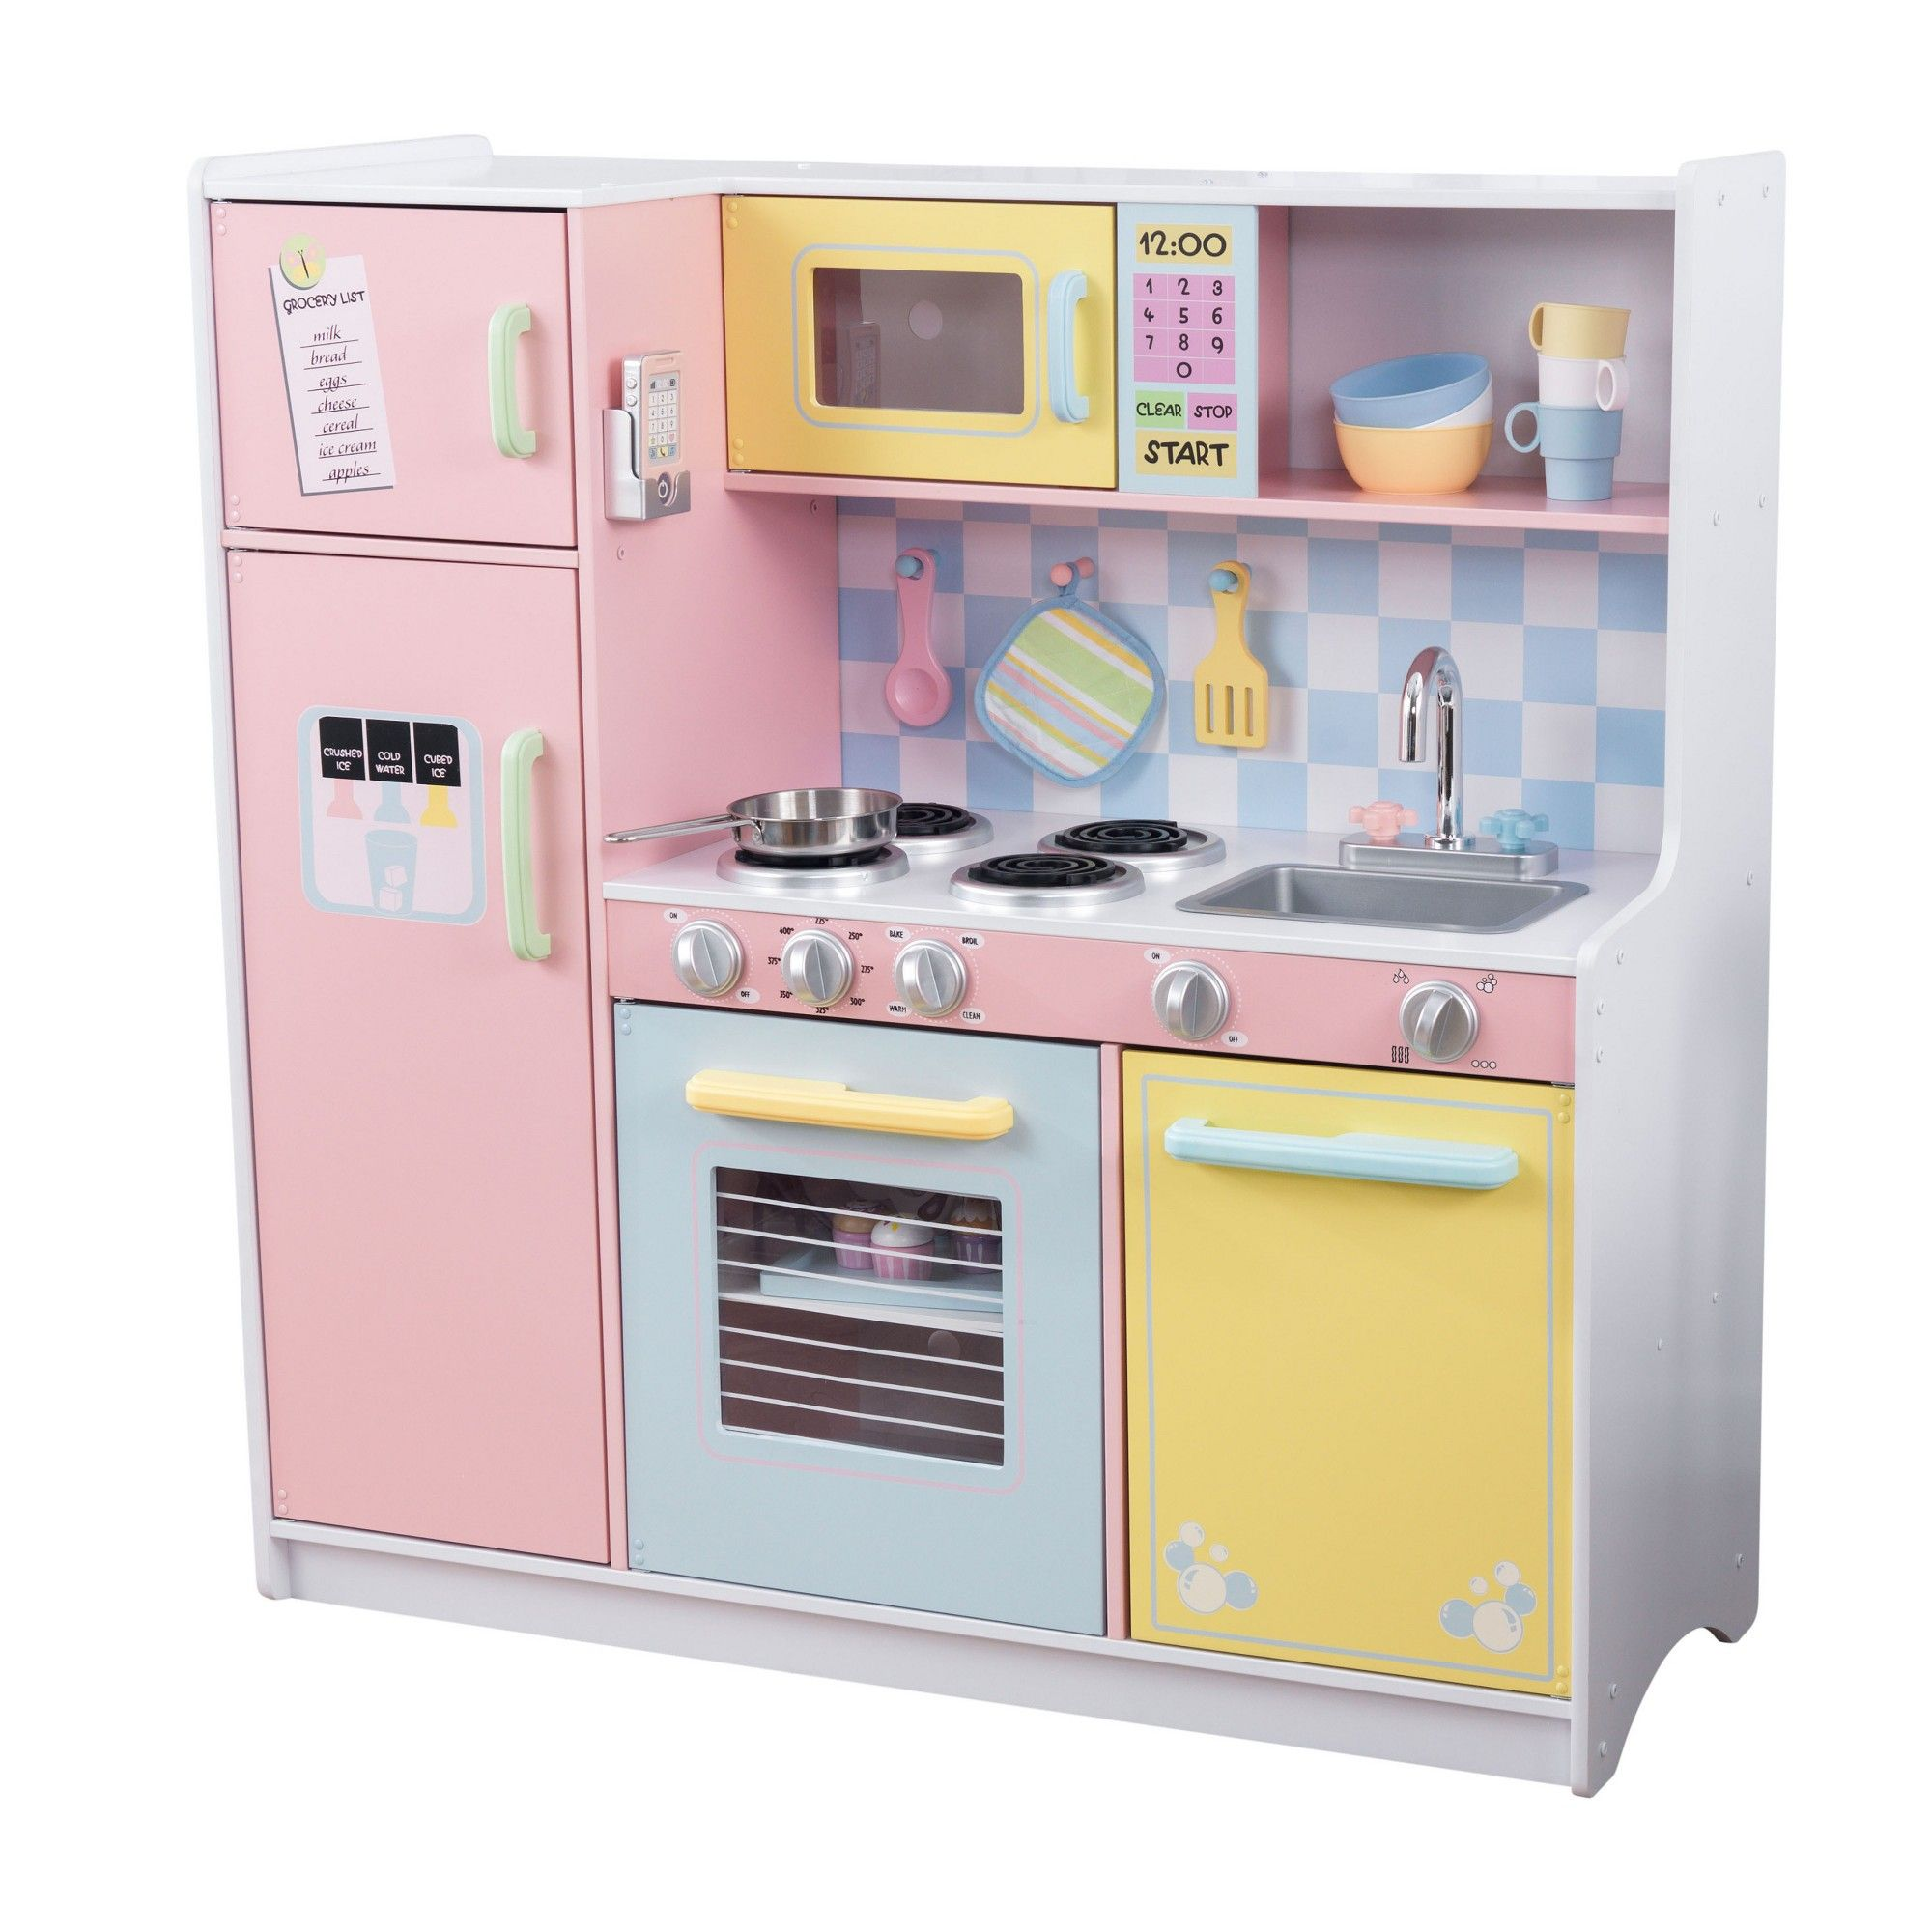 Toy Kitchen Sets Stone Island Kidkraft Large Pastel Products Toys